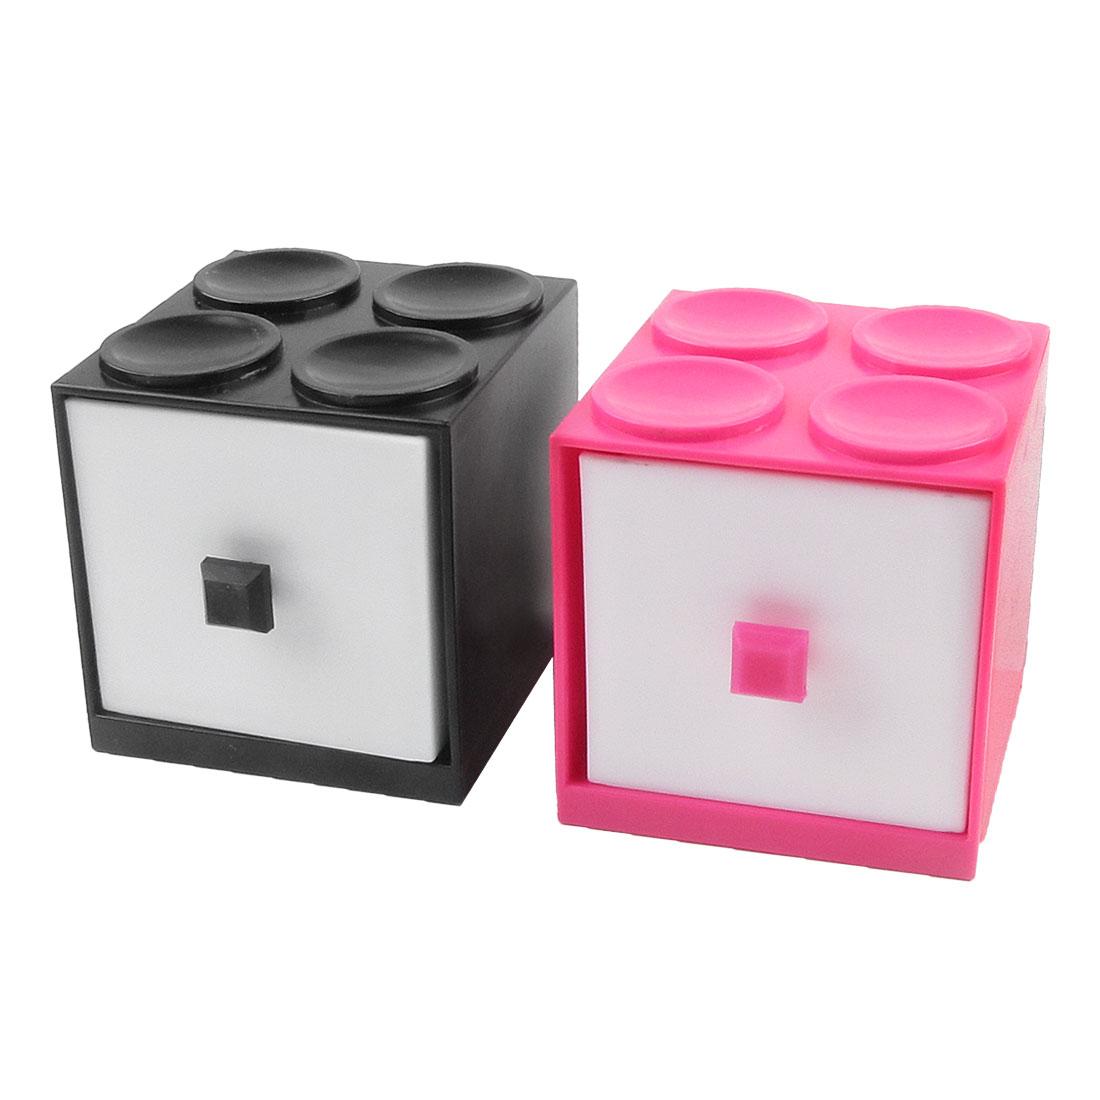 Plastic Block Model Fuchsia Black Case White Drawer Makeup Holder Container Box